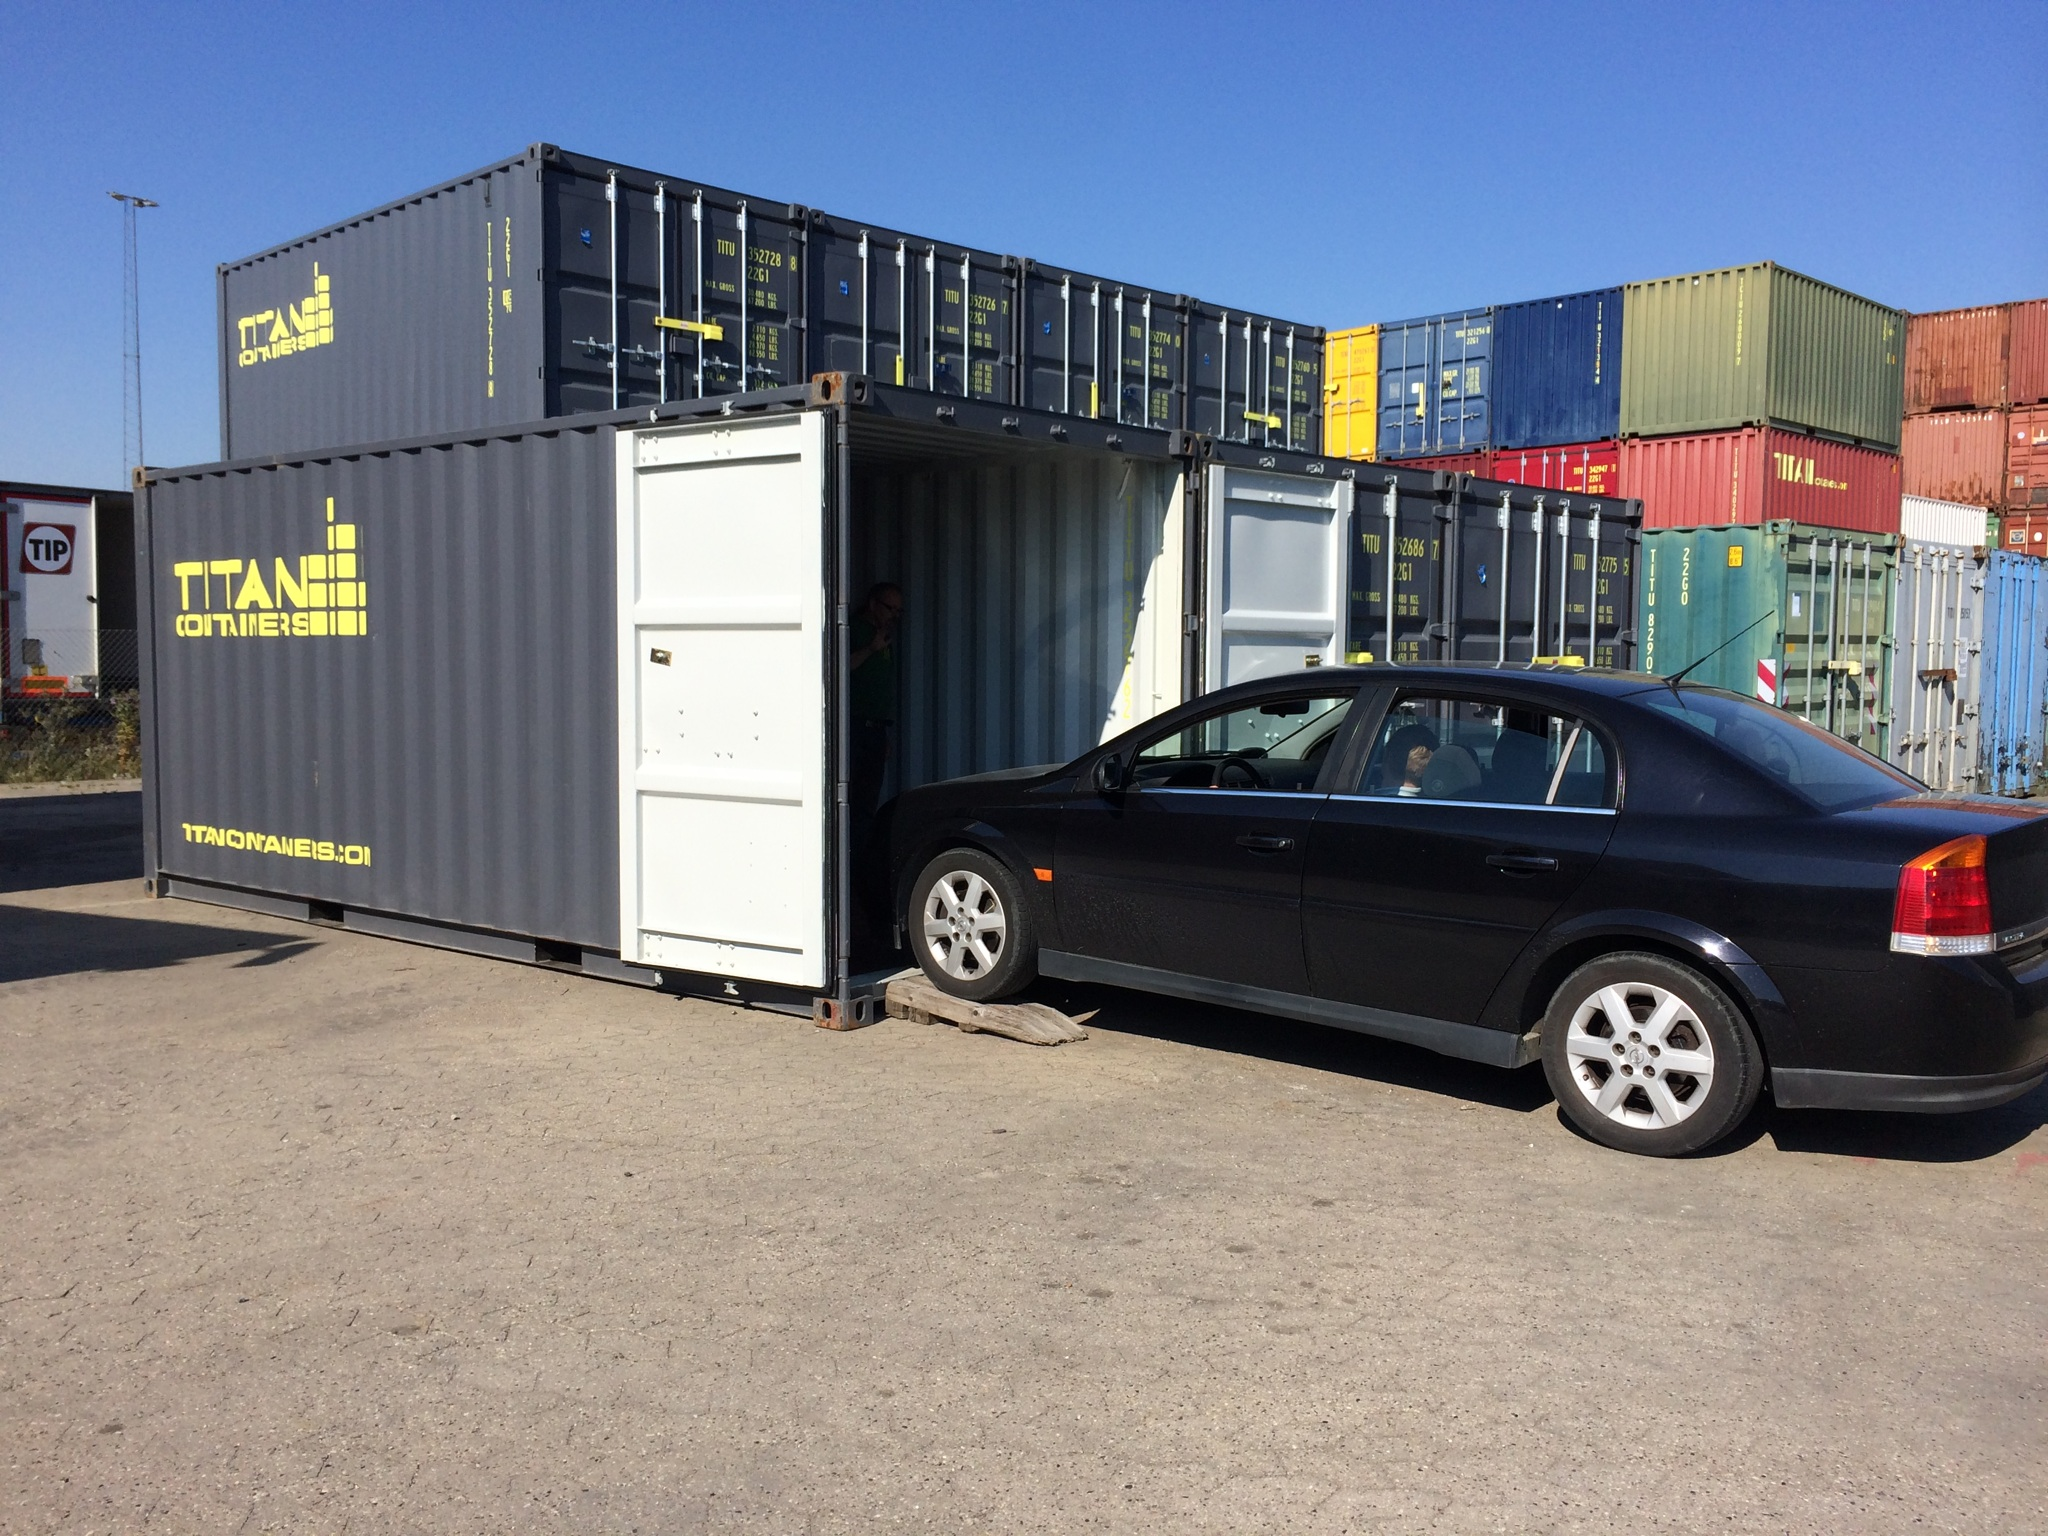 SELF STORAGE FACILITY TITAN CONTAINERS Car Storage